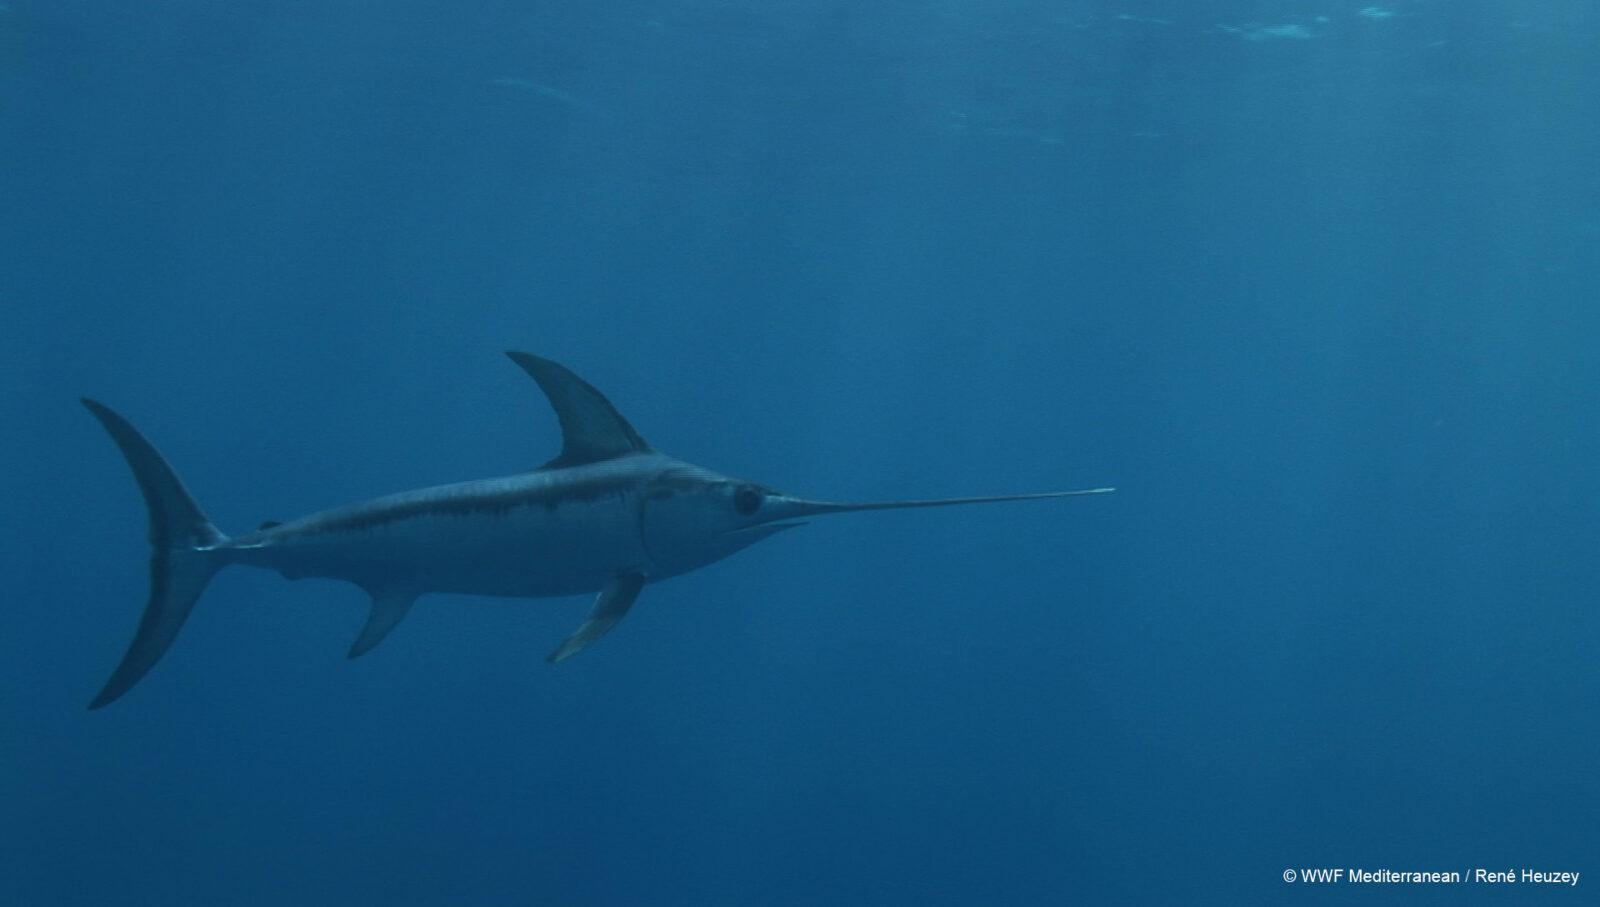 Swordfish Rene Heuzey